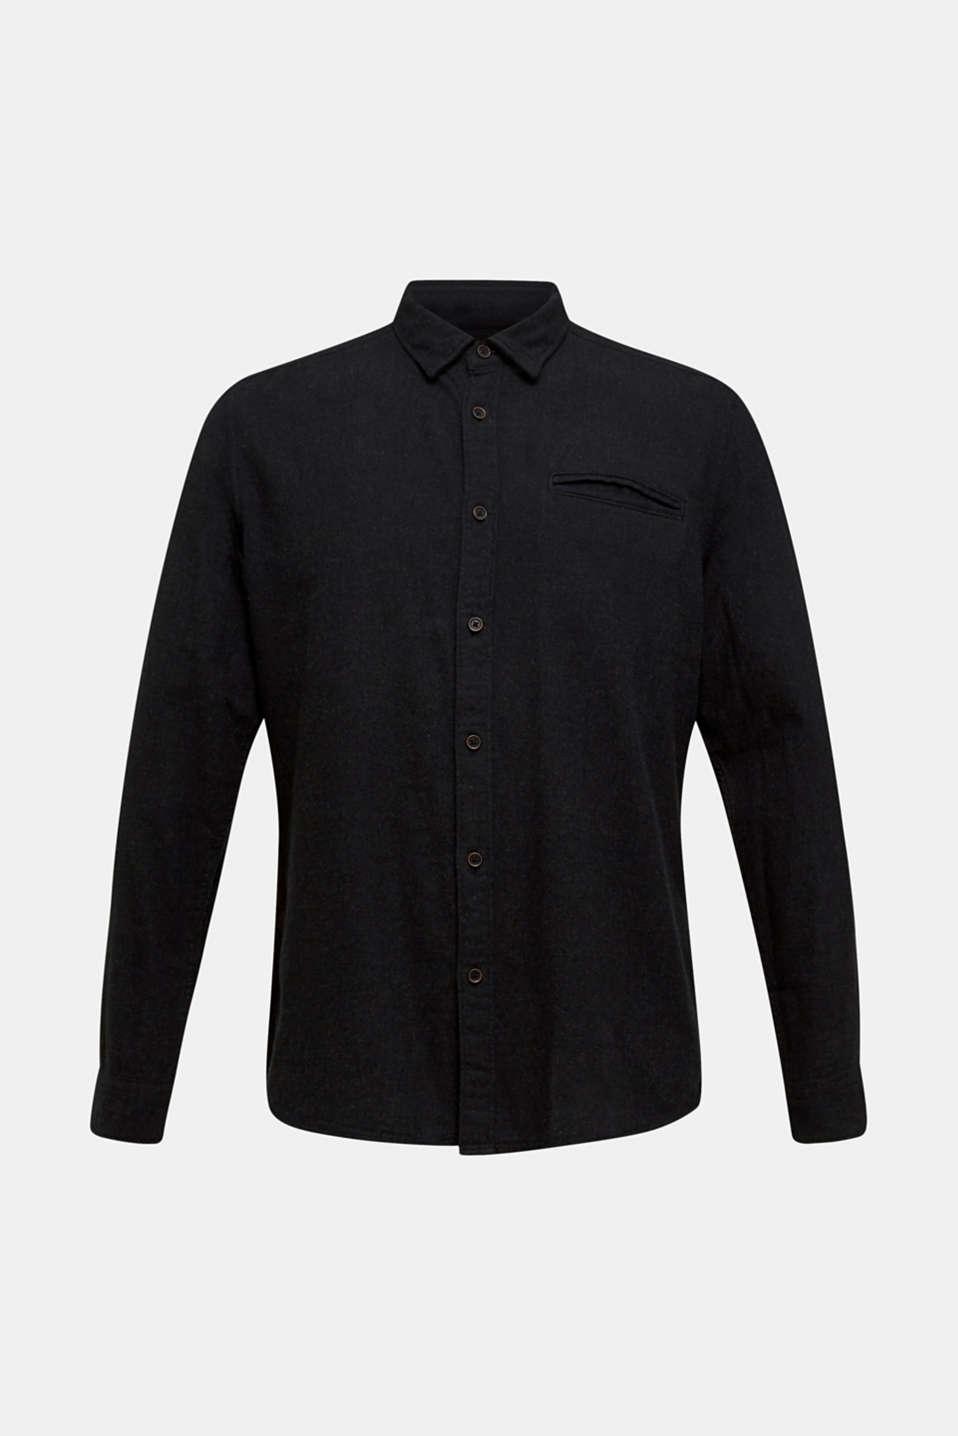 Shirts woven Slim fit, DARK GREY 5, detail image number 6